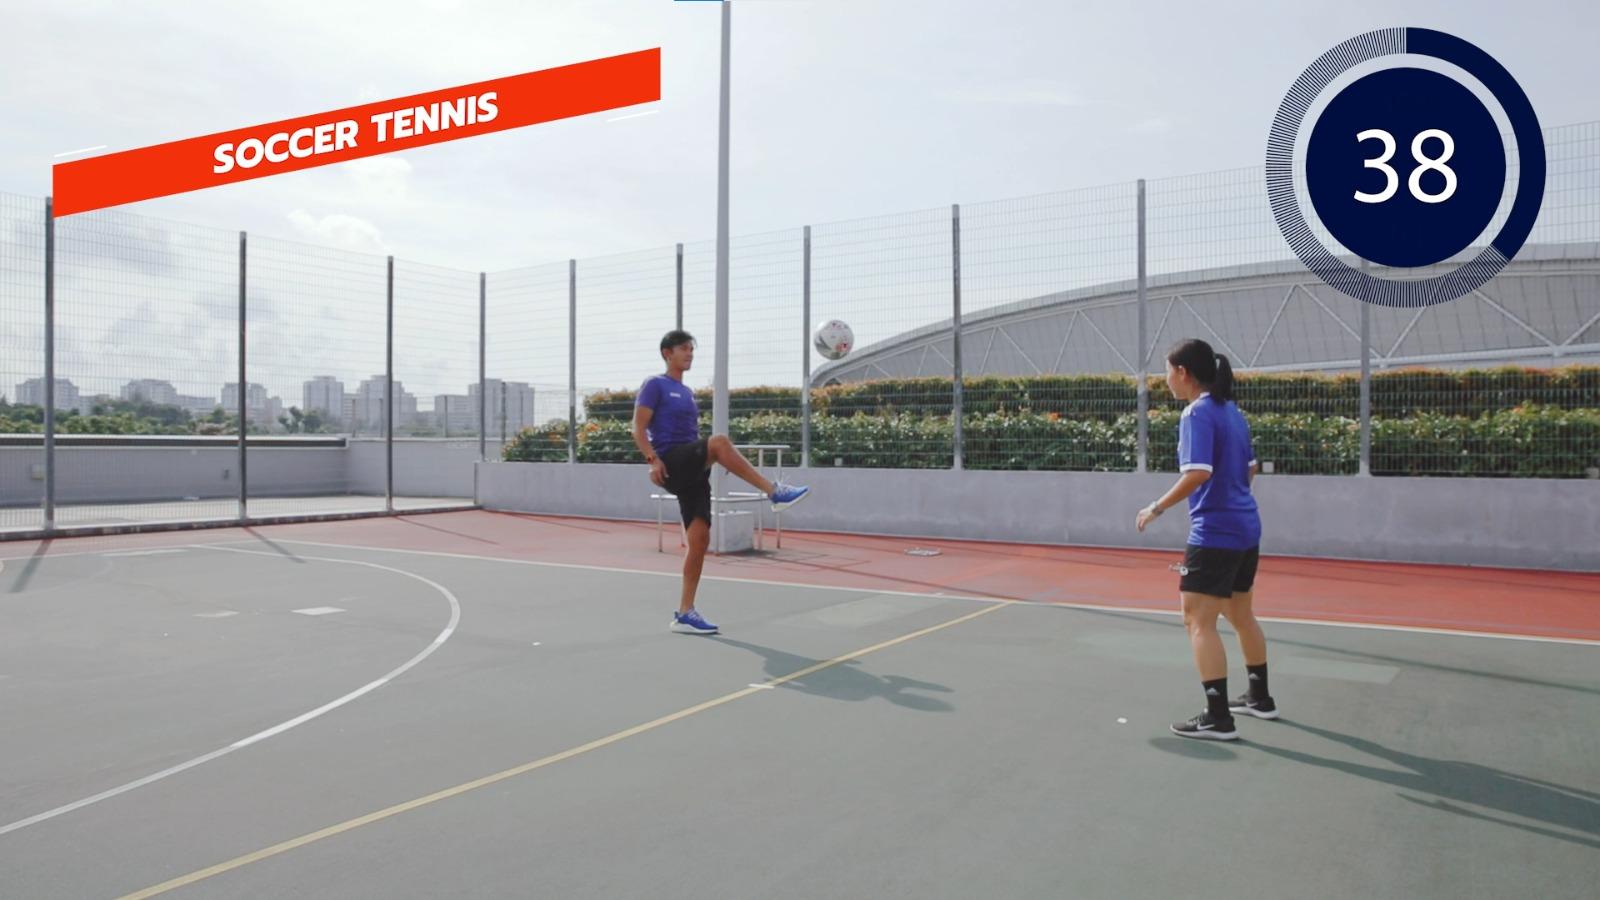 football - soccer tennis